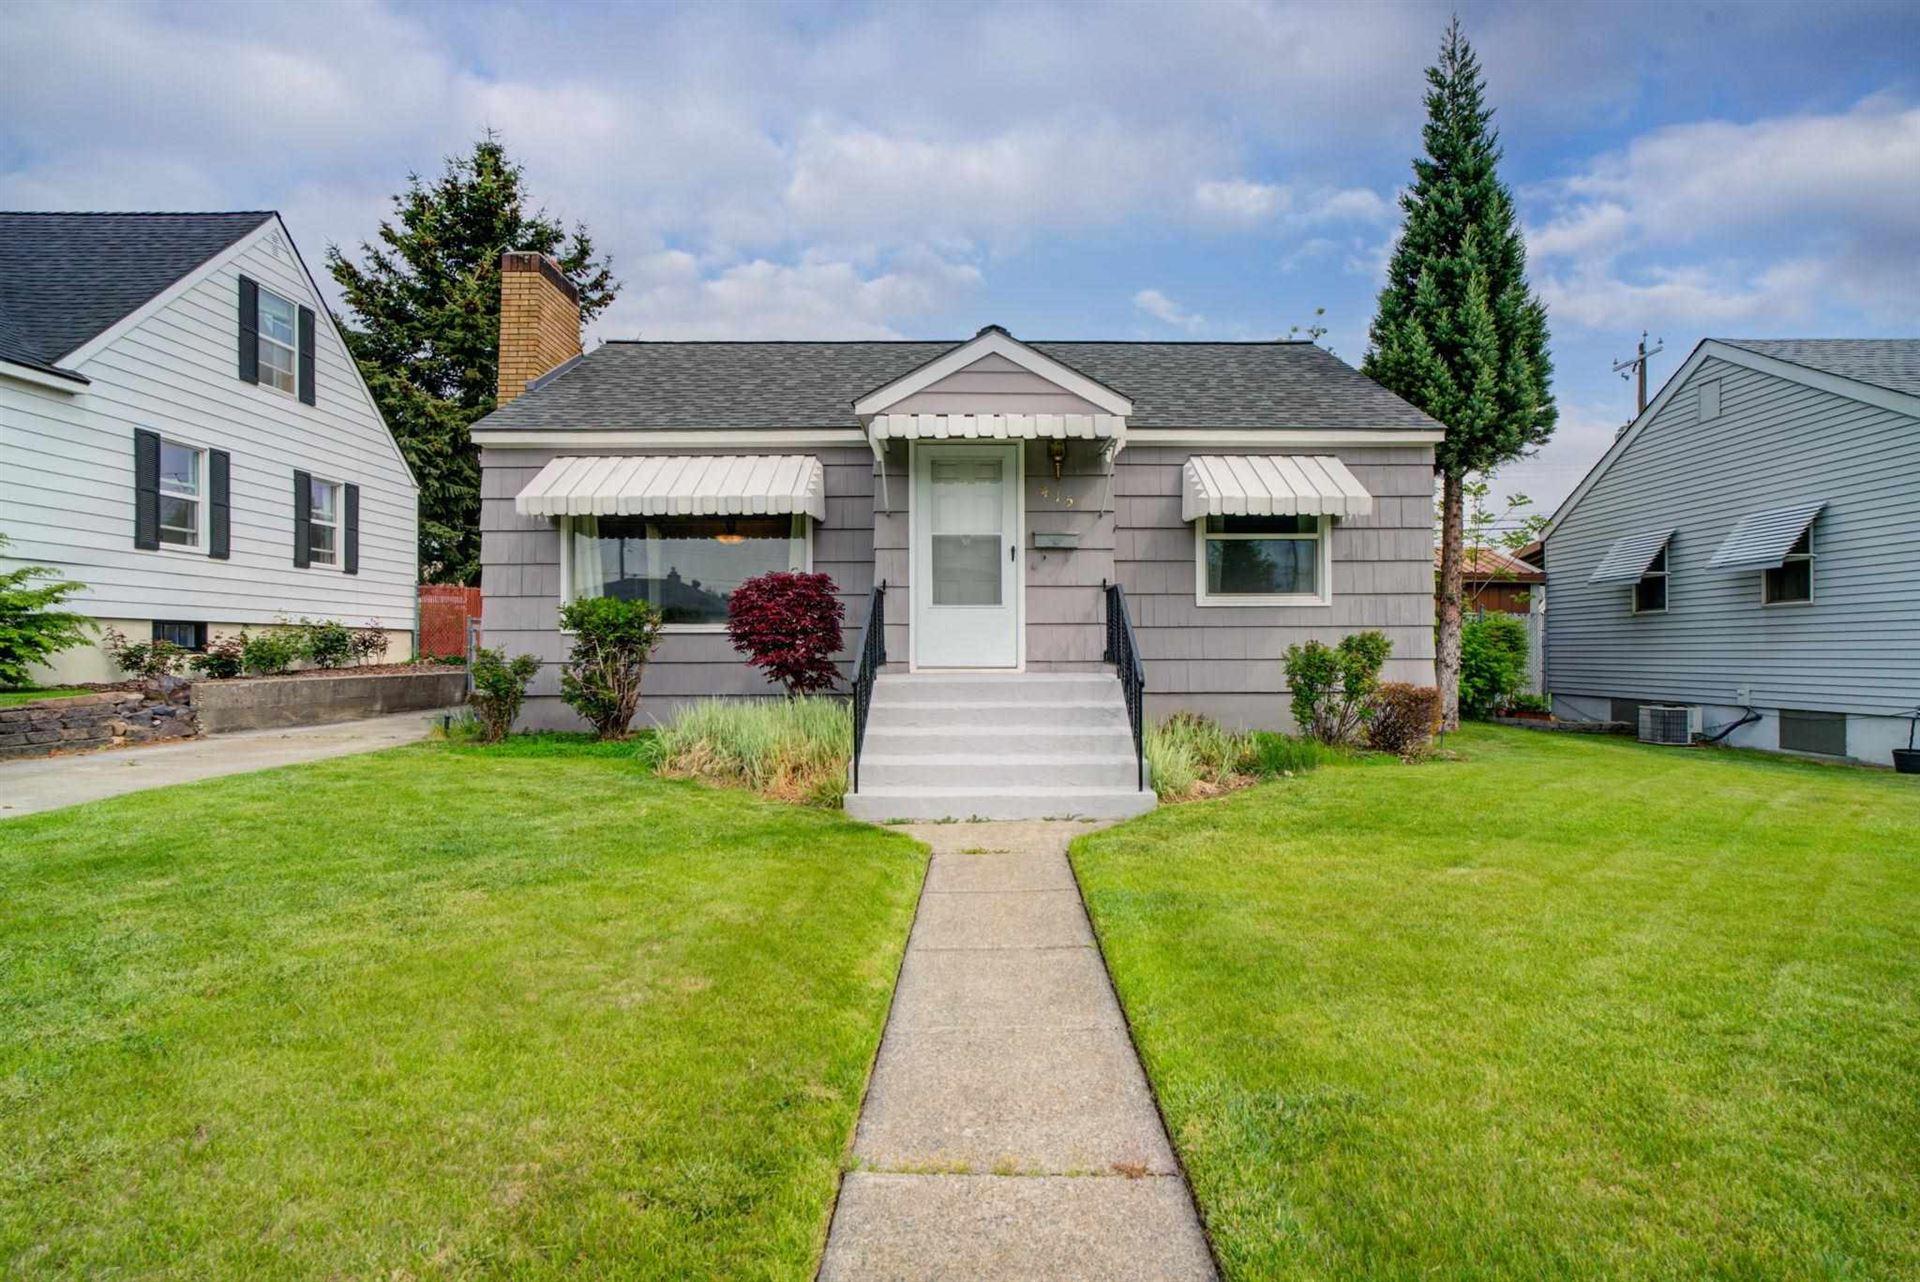 Photo of 415 E Garland Ave, Spokane, WA 99207 (MLS # 202115484)